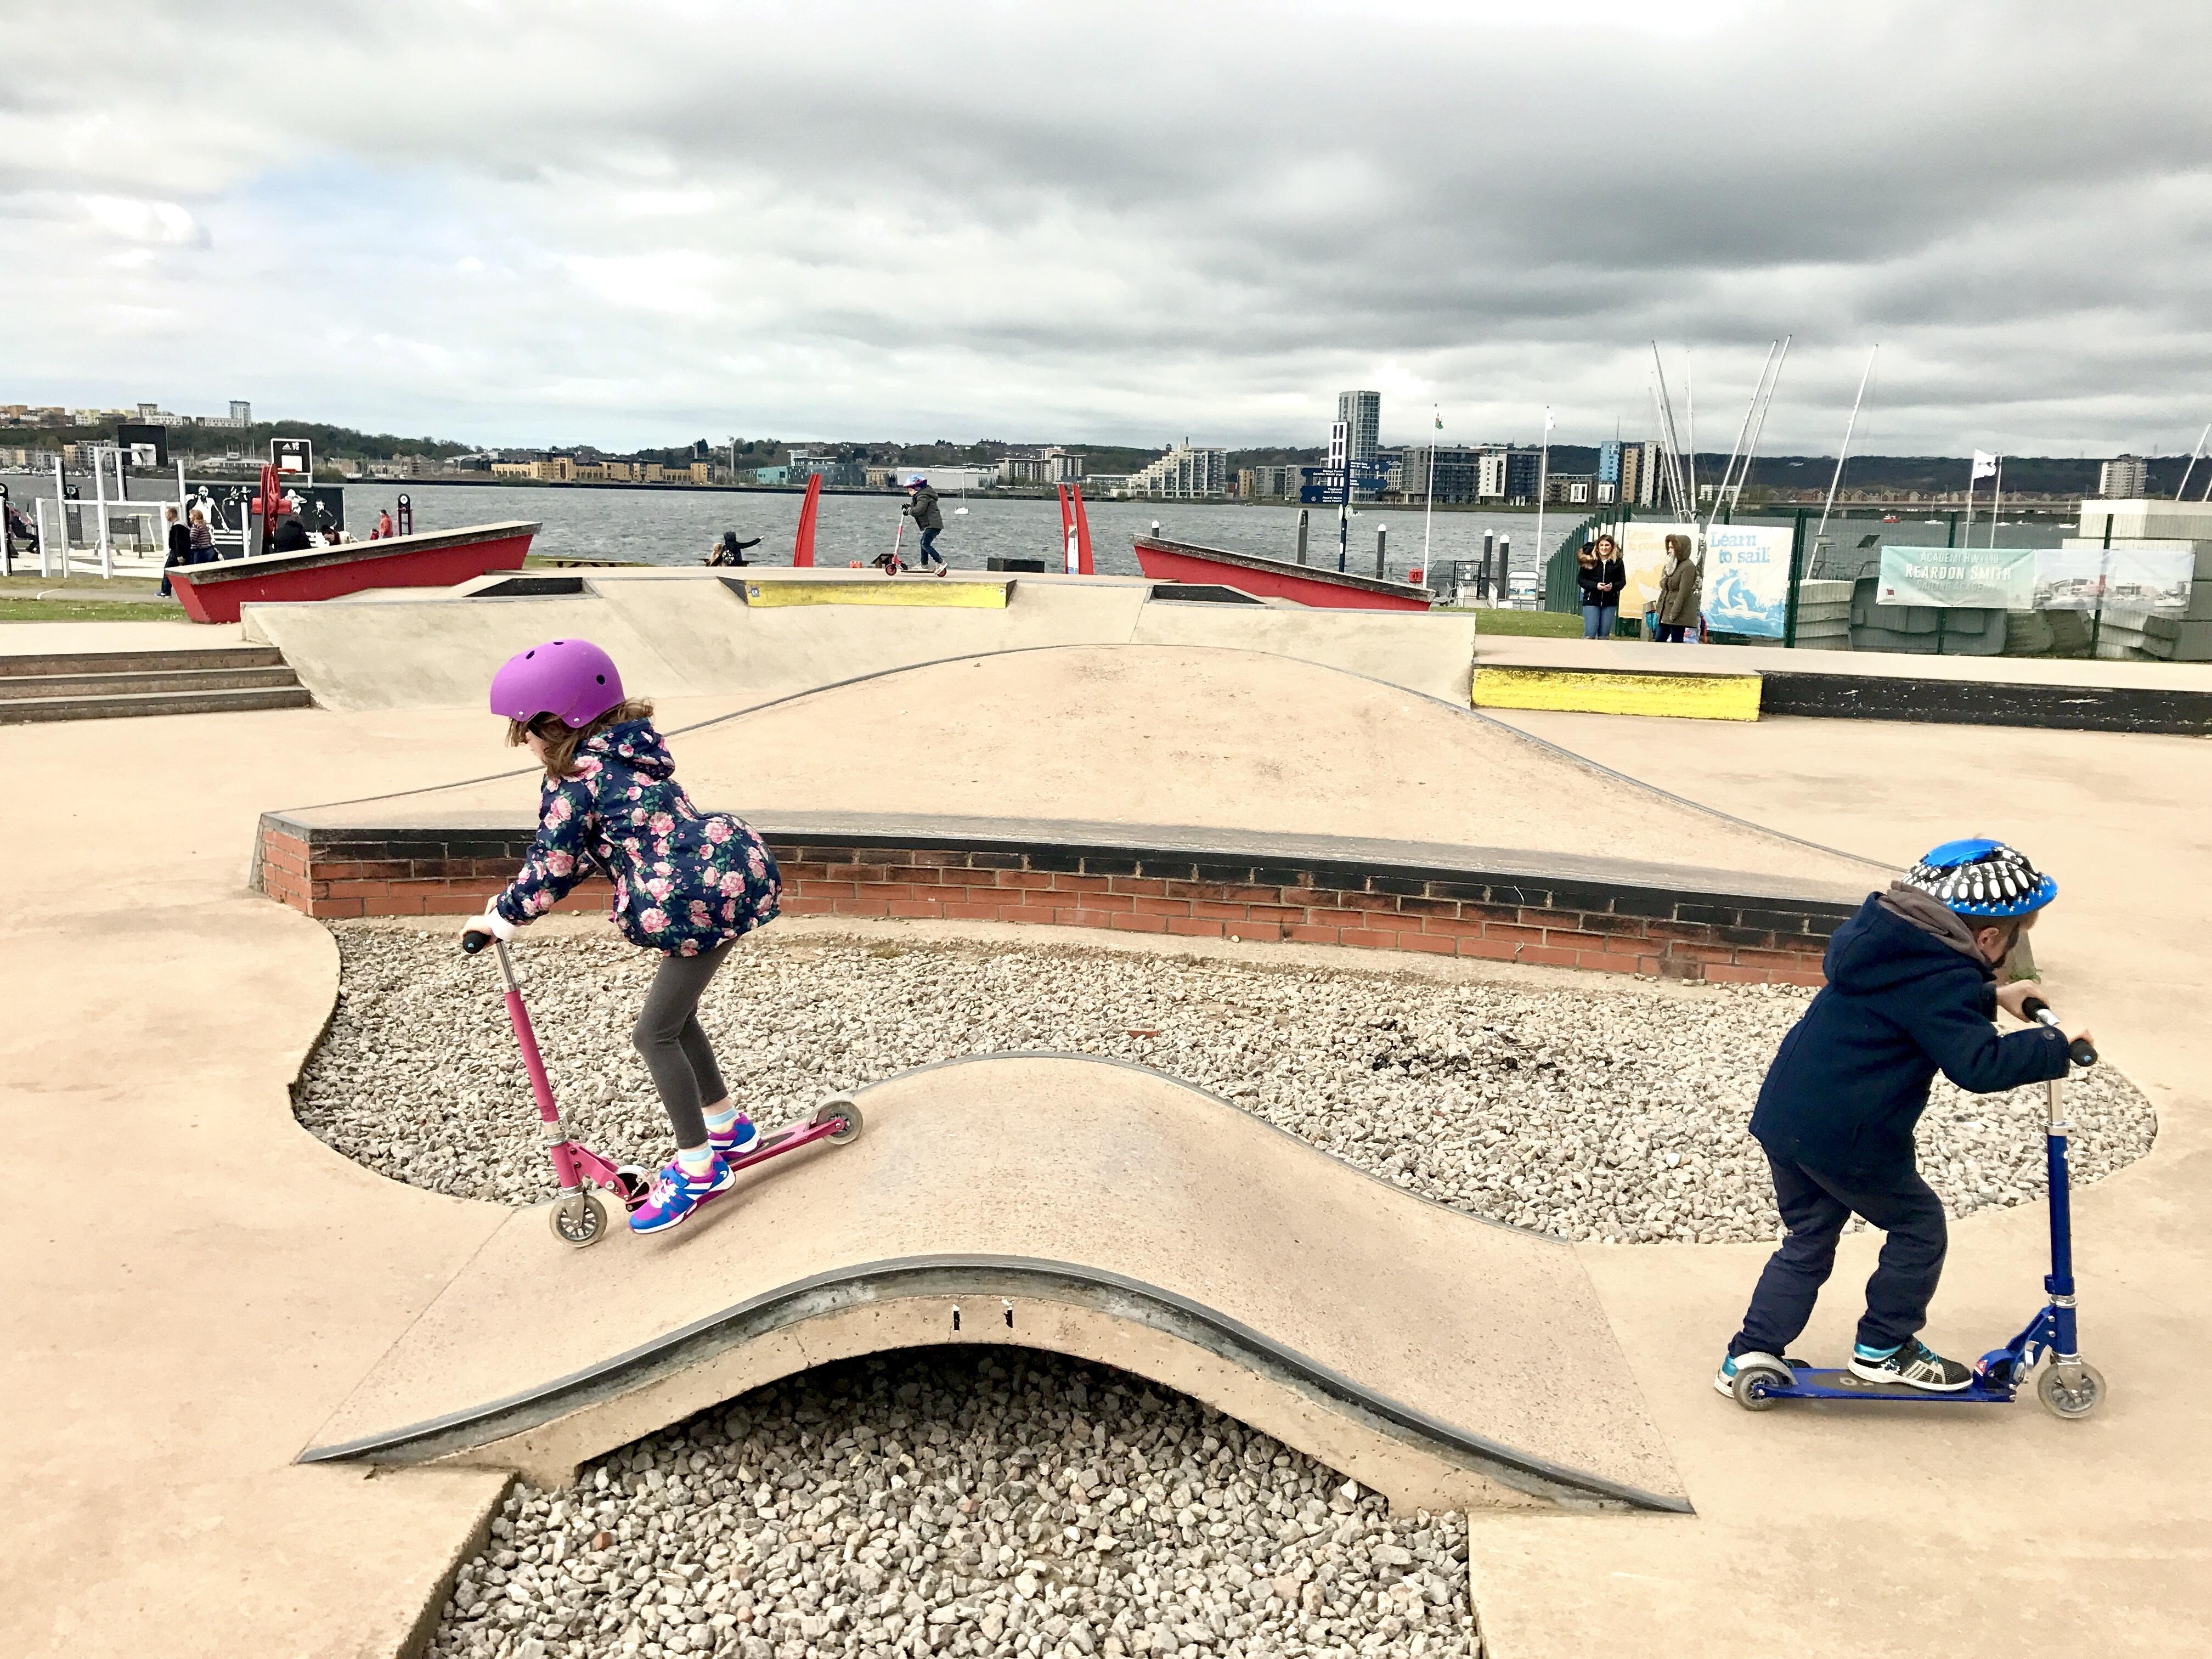 Cardiff Bay Barrage Skate Park